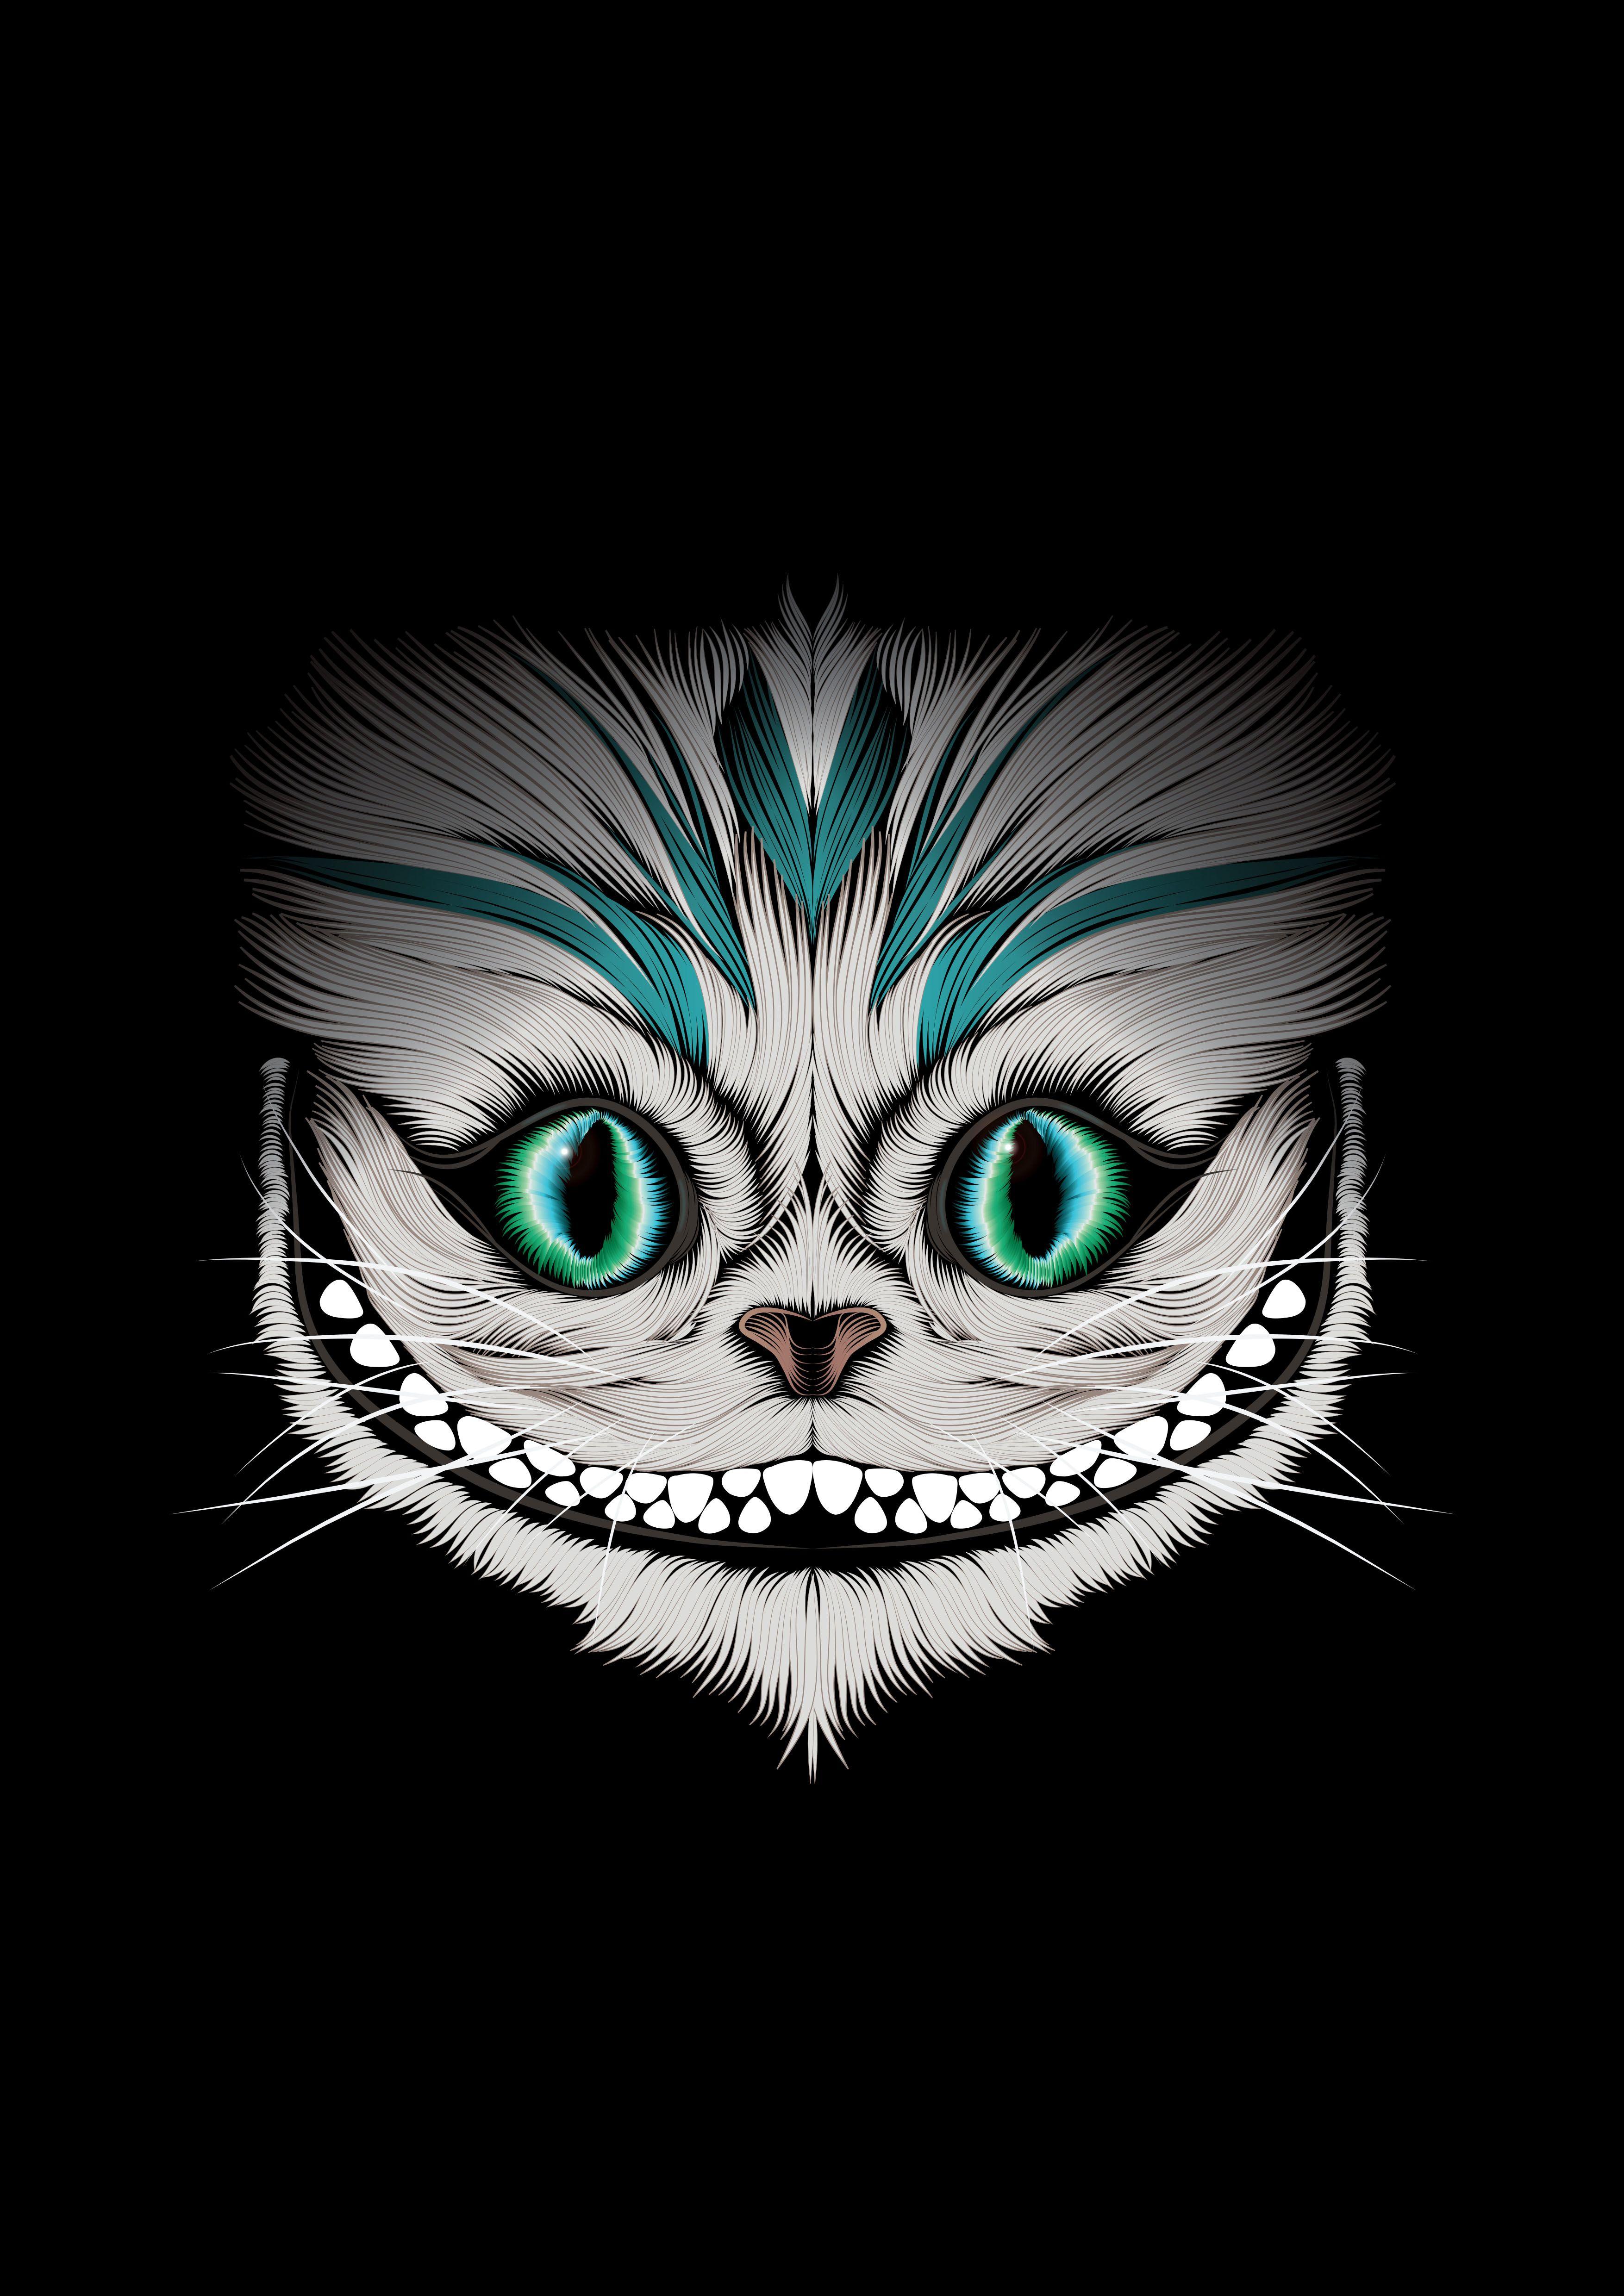 https://www.behance.net/gallery/19209039/Cheshire-Cat